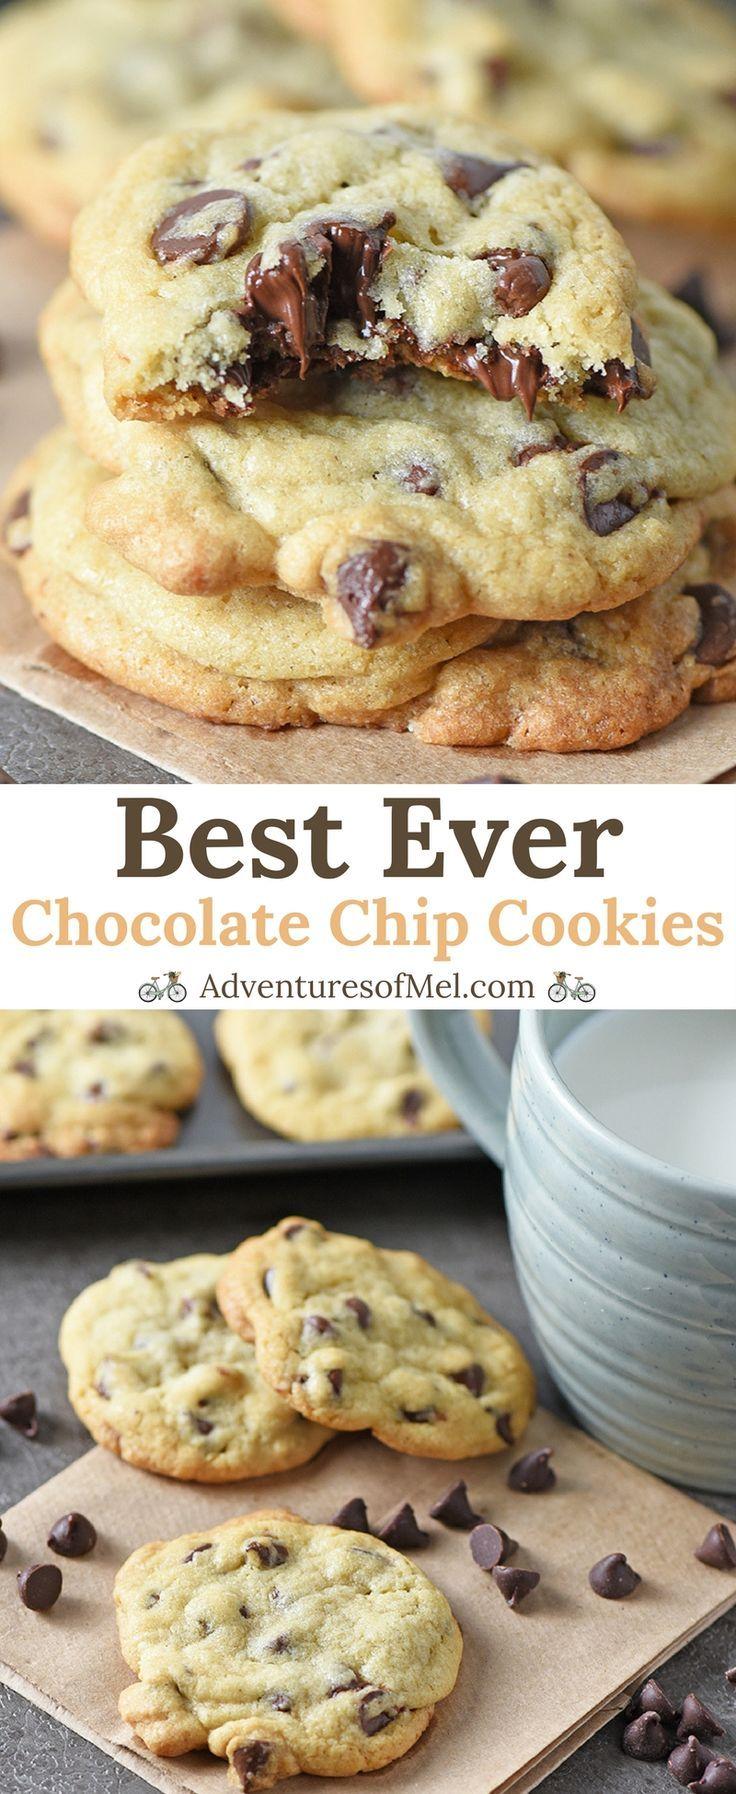 Chocolate Chip Cookies... best? Hmm...